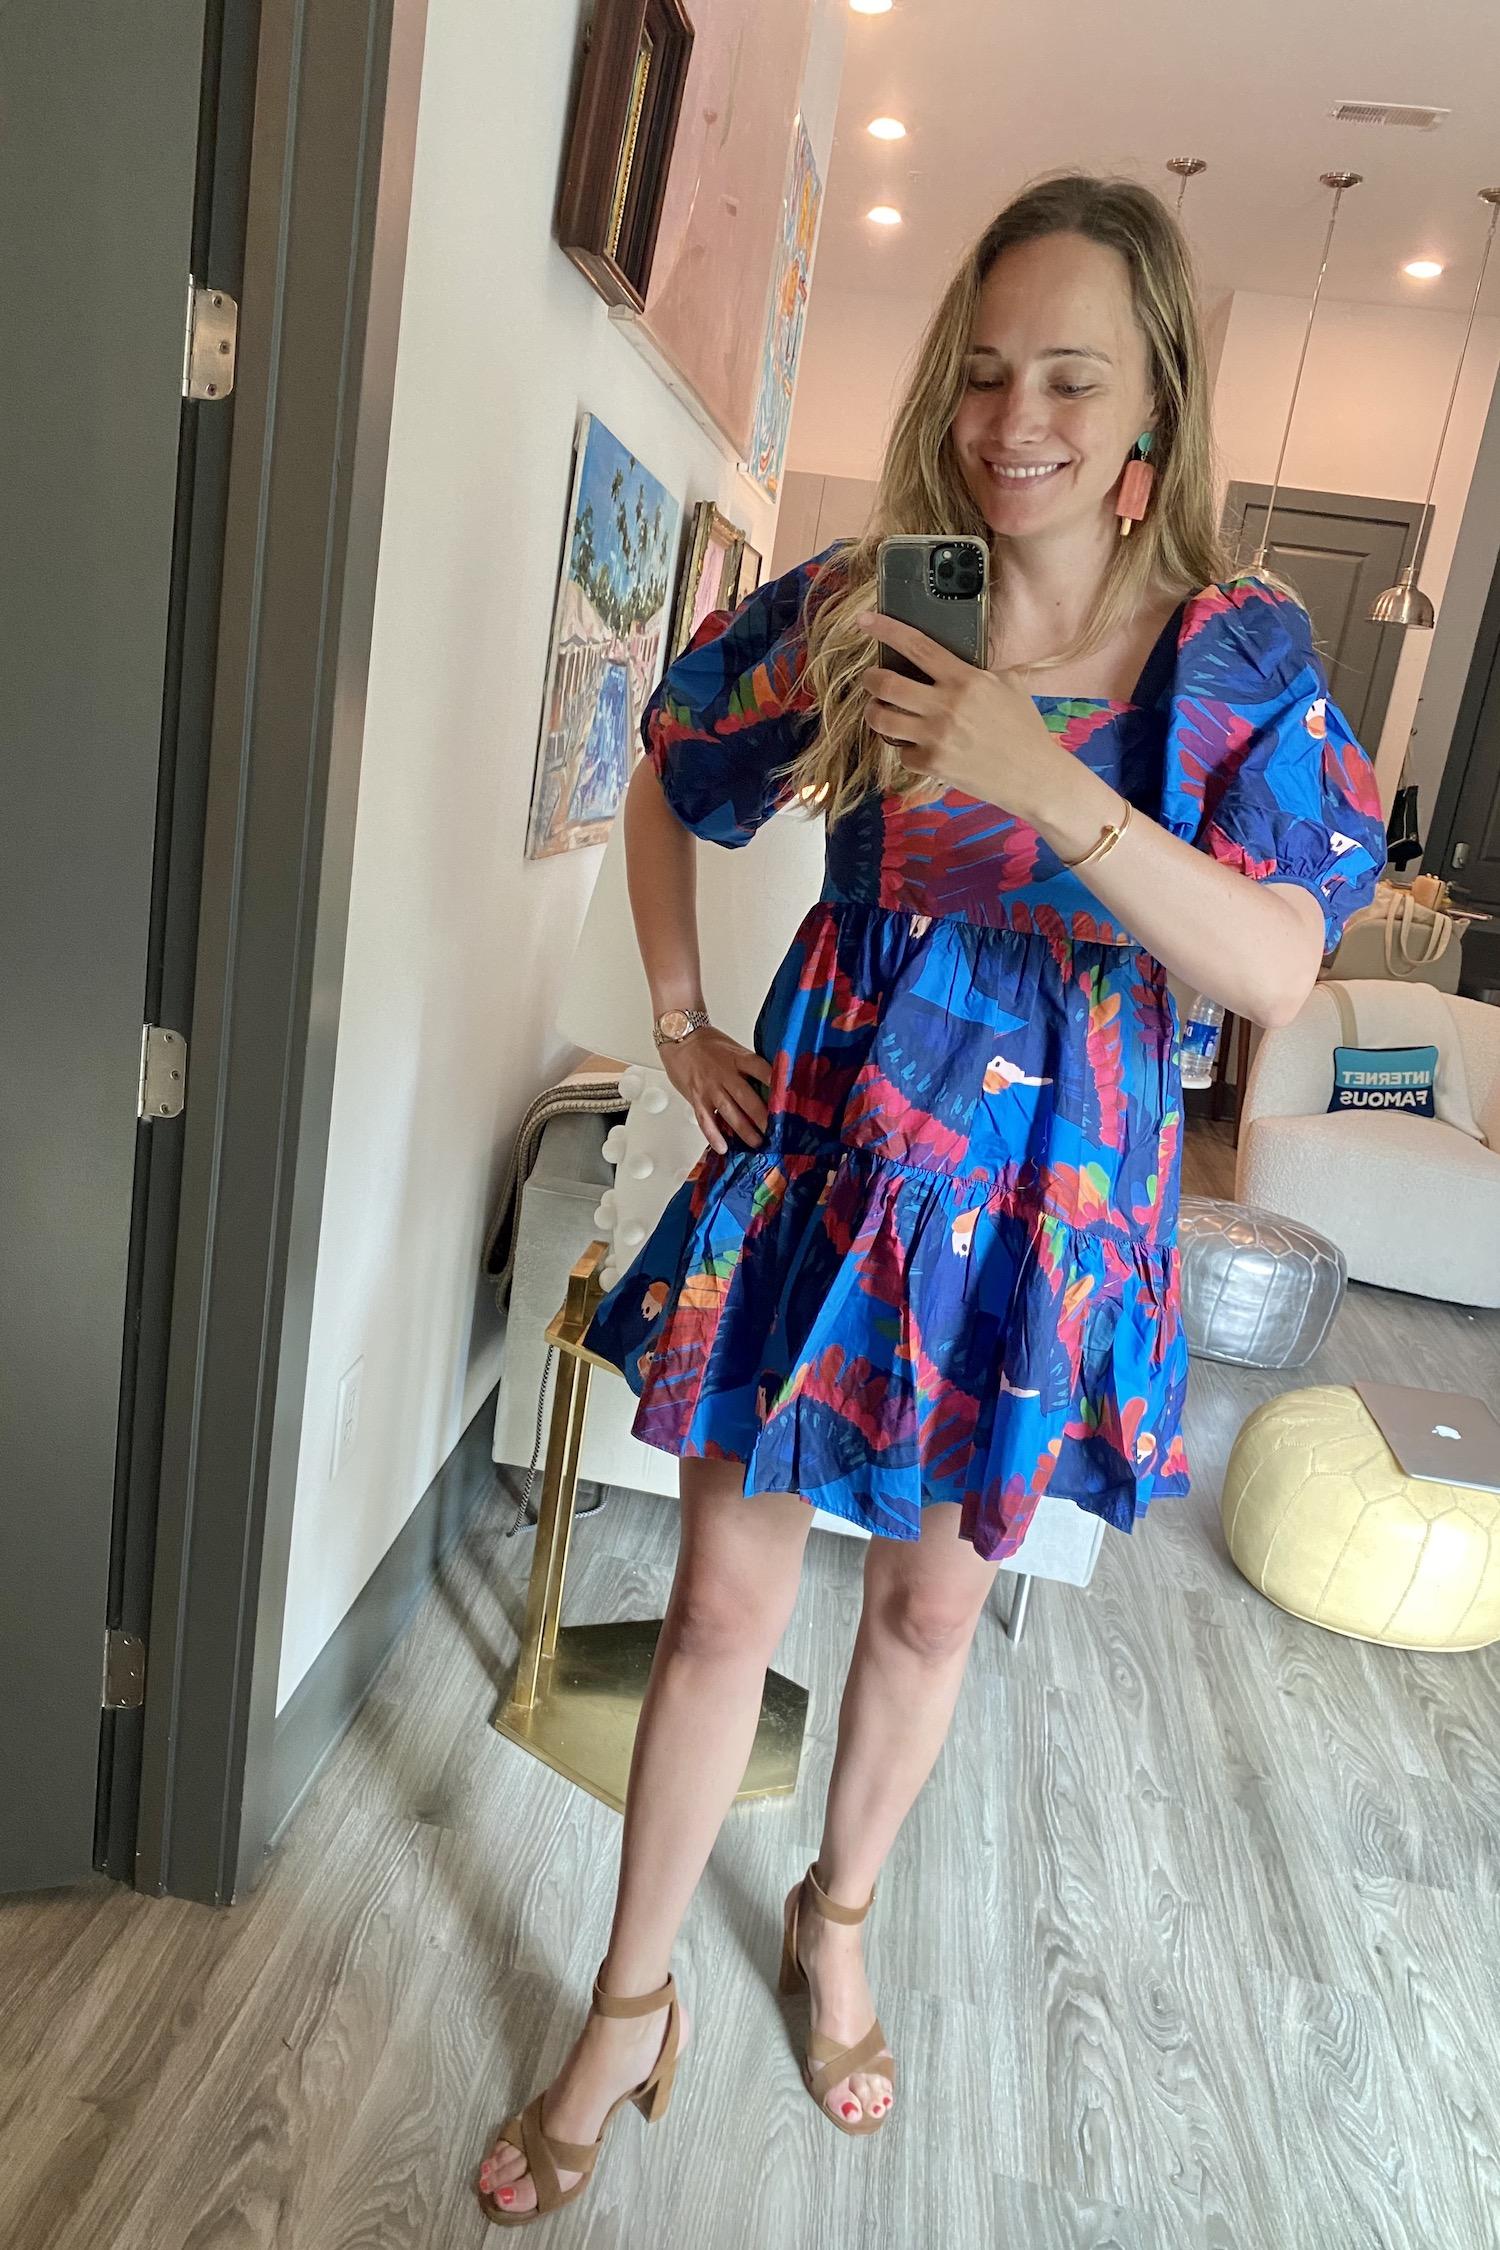 Farm Rio dress | What I Wore Last Week 6.2.21